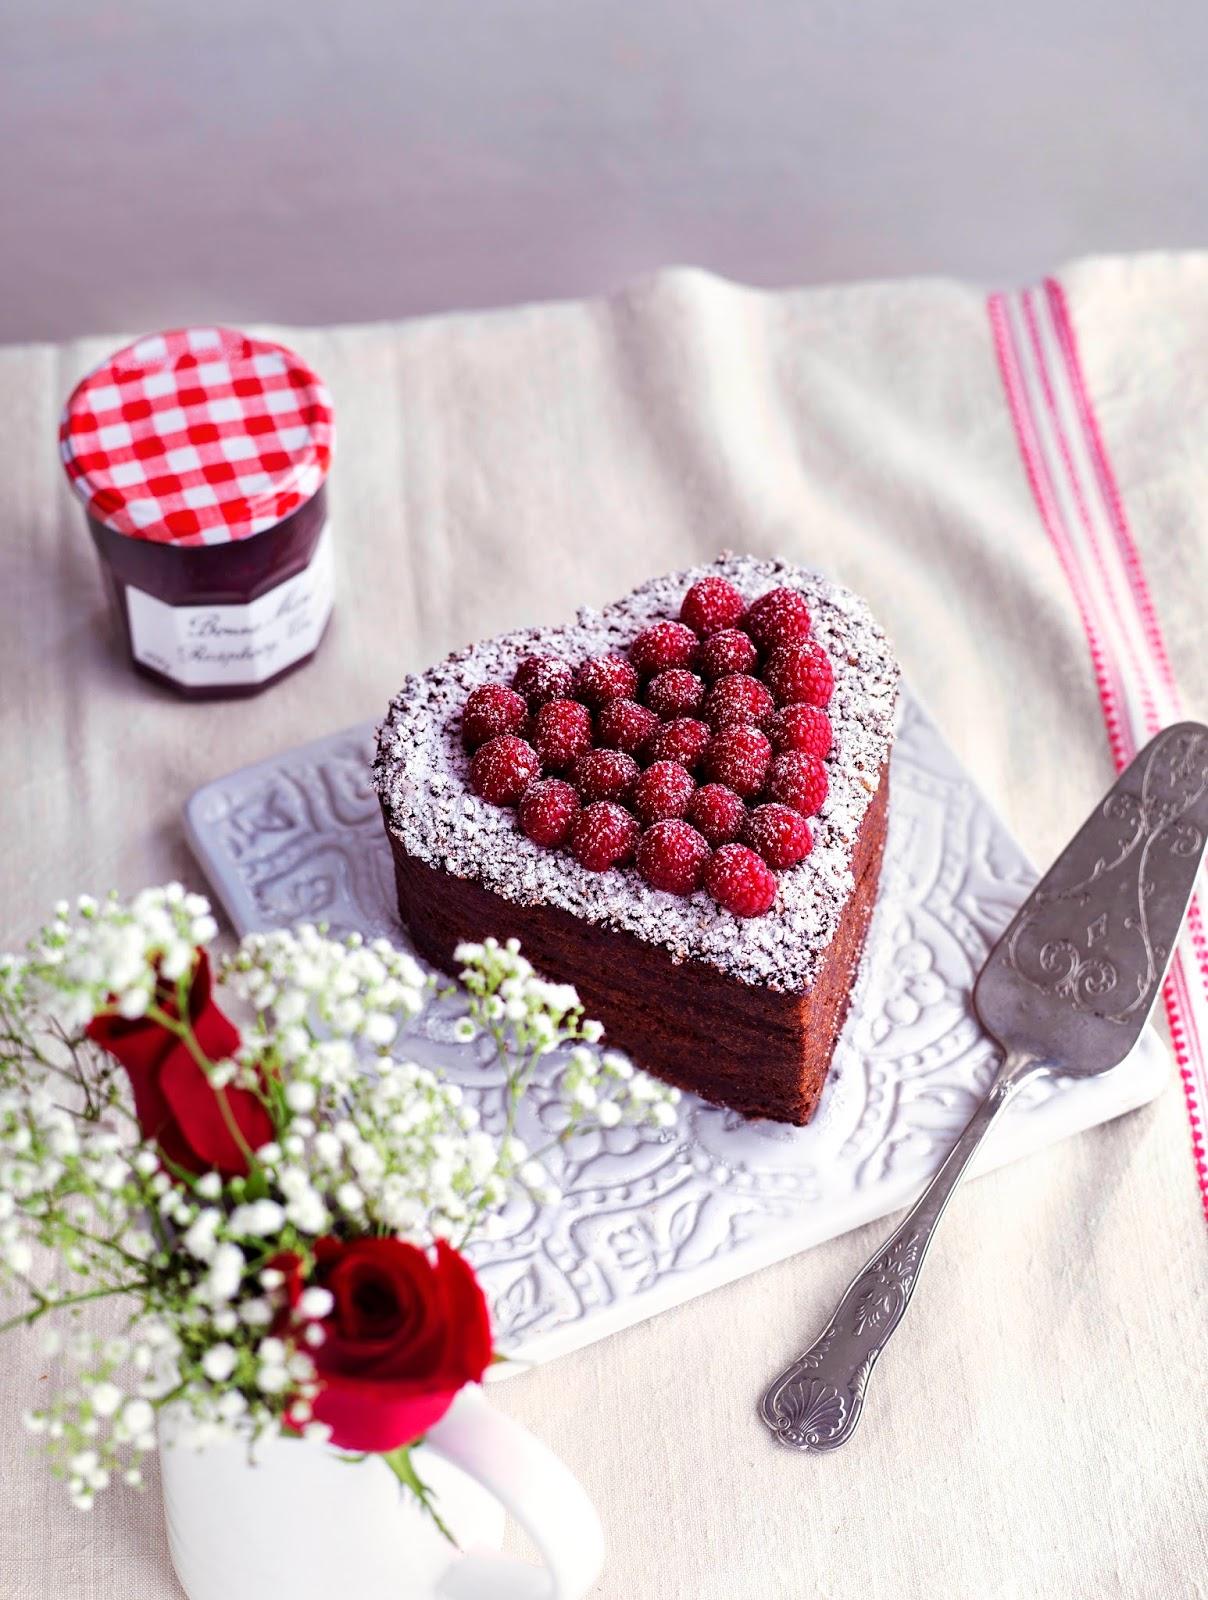 Gateau au Coeur de Chocolat: Valentines Cake